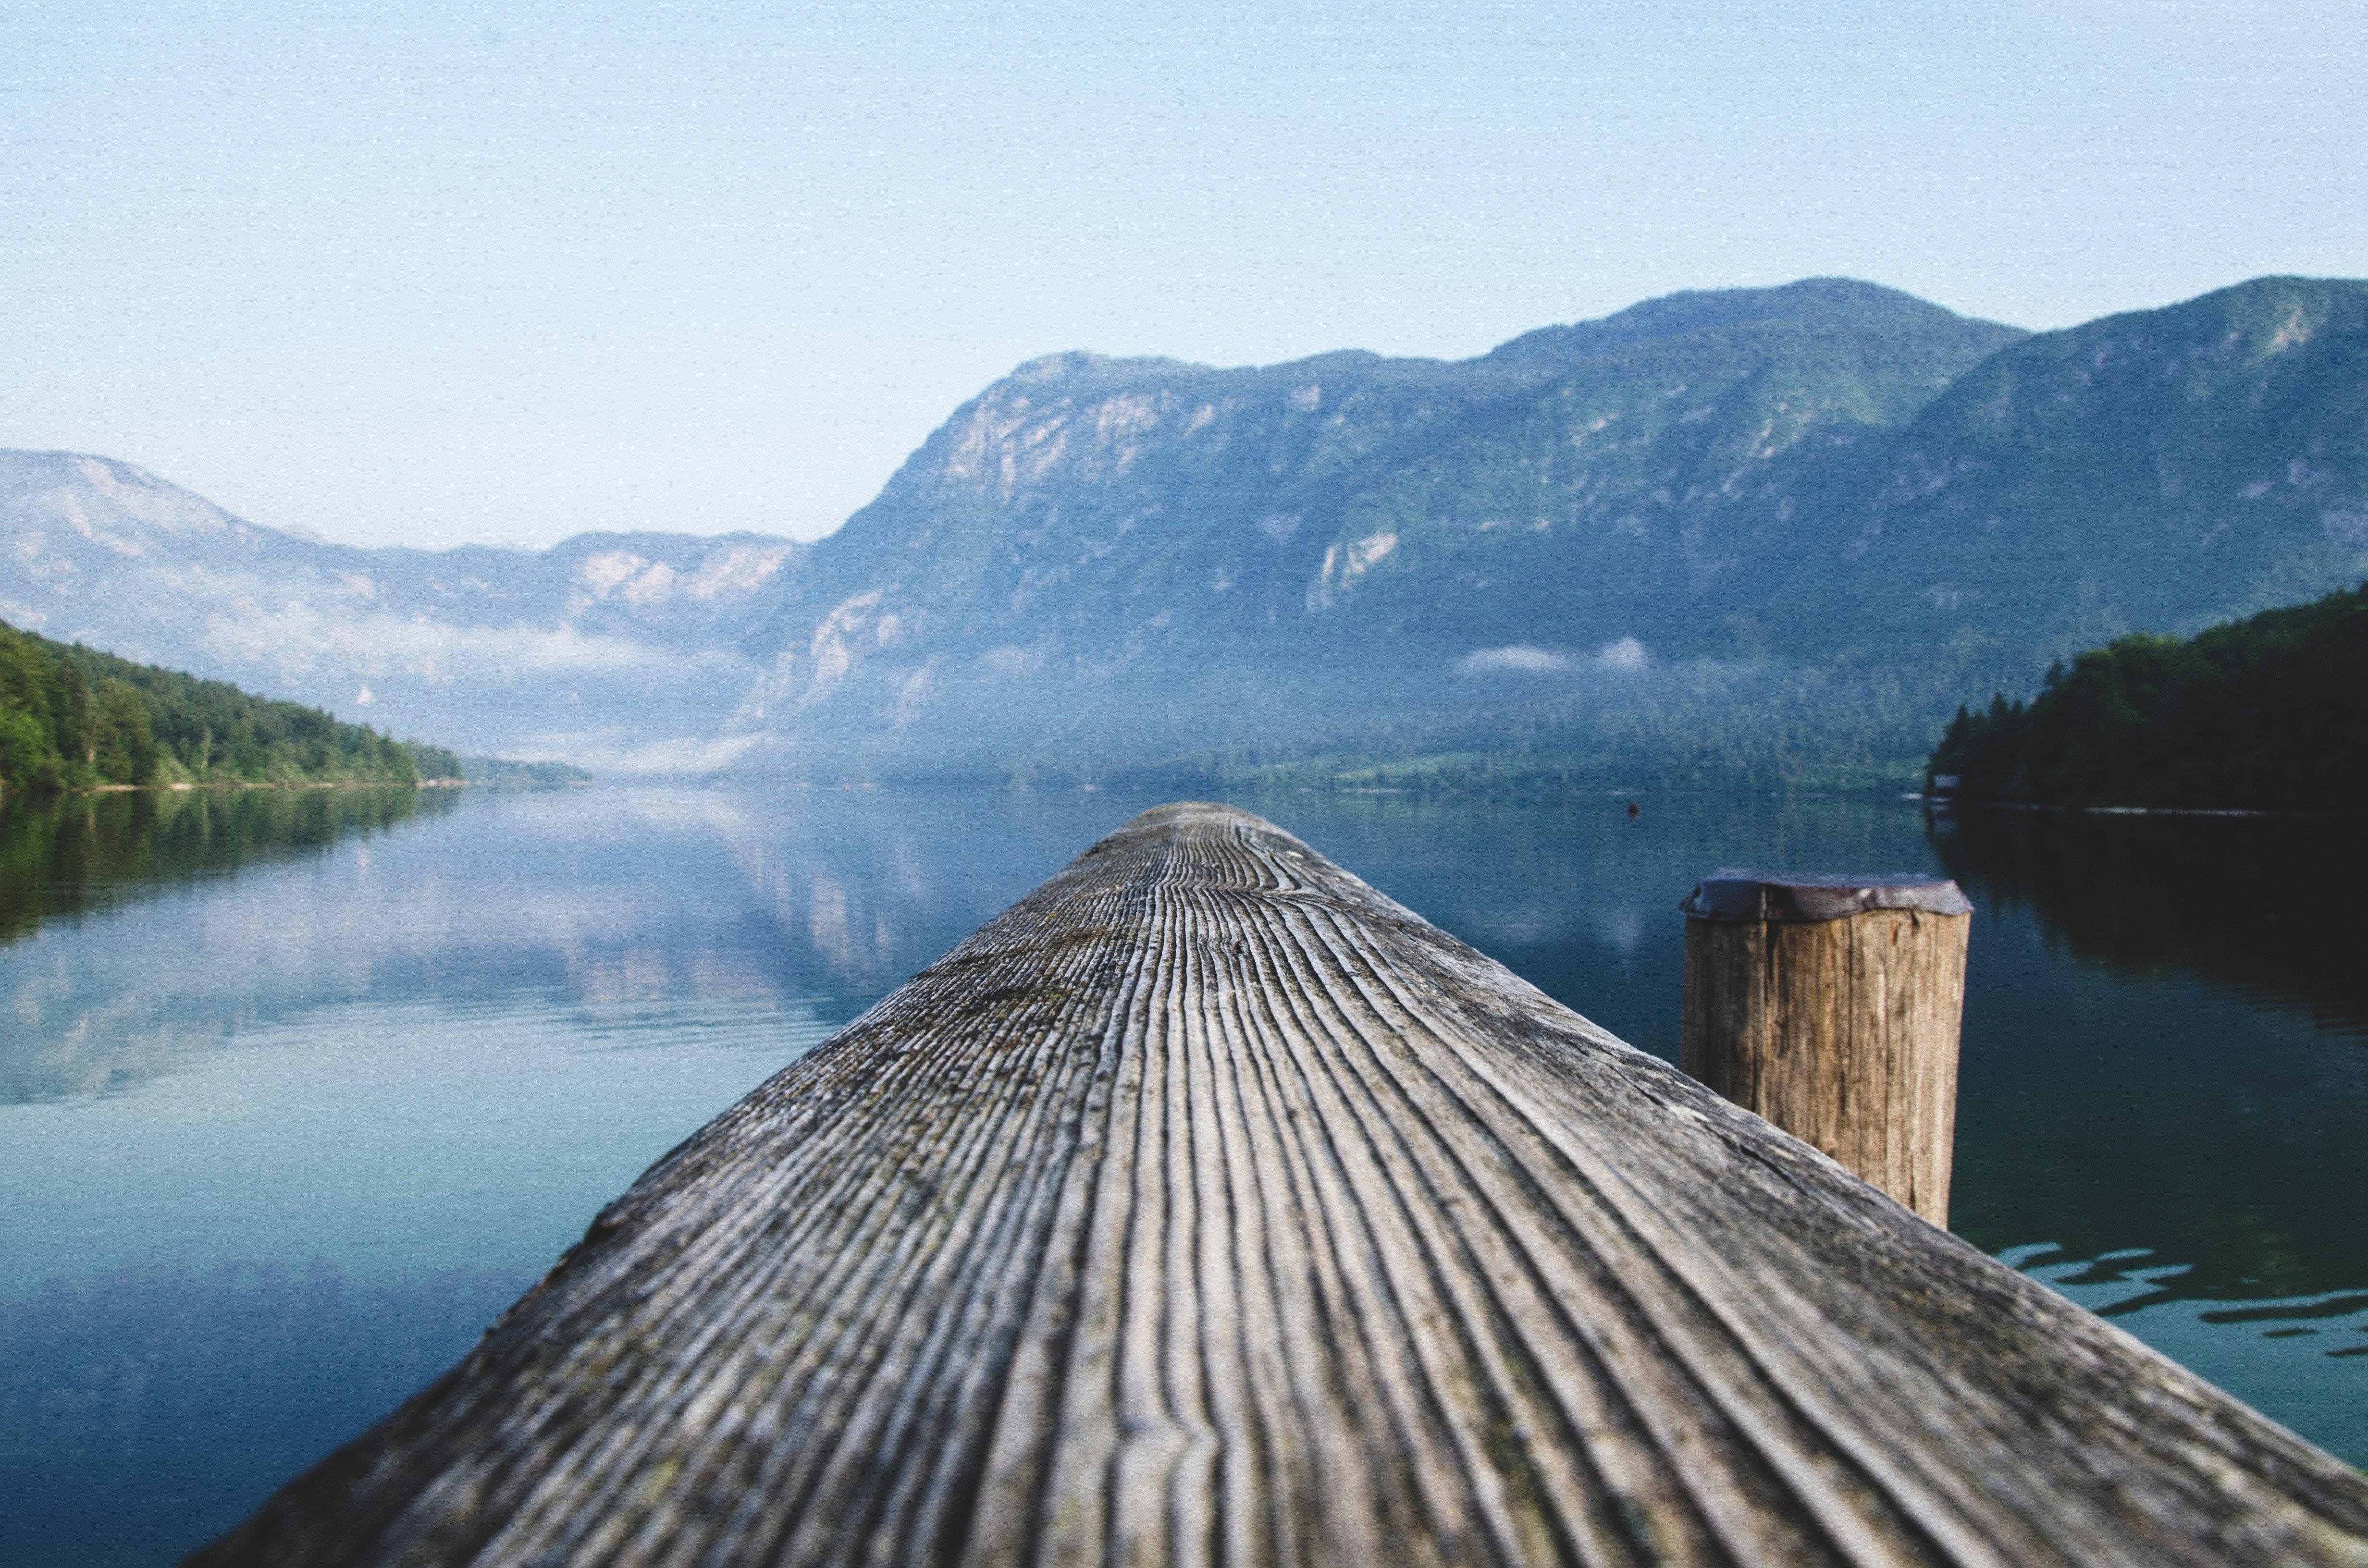 adventure-alps-background-beautiful-547114